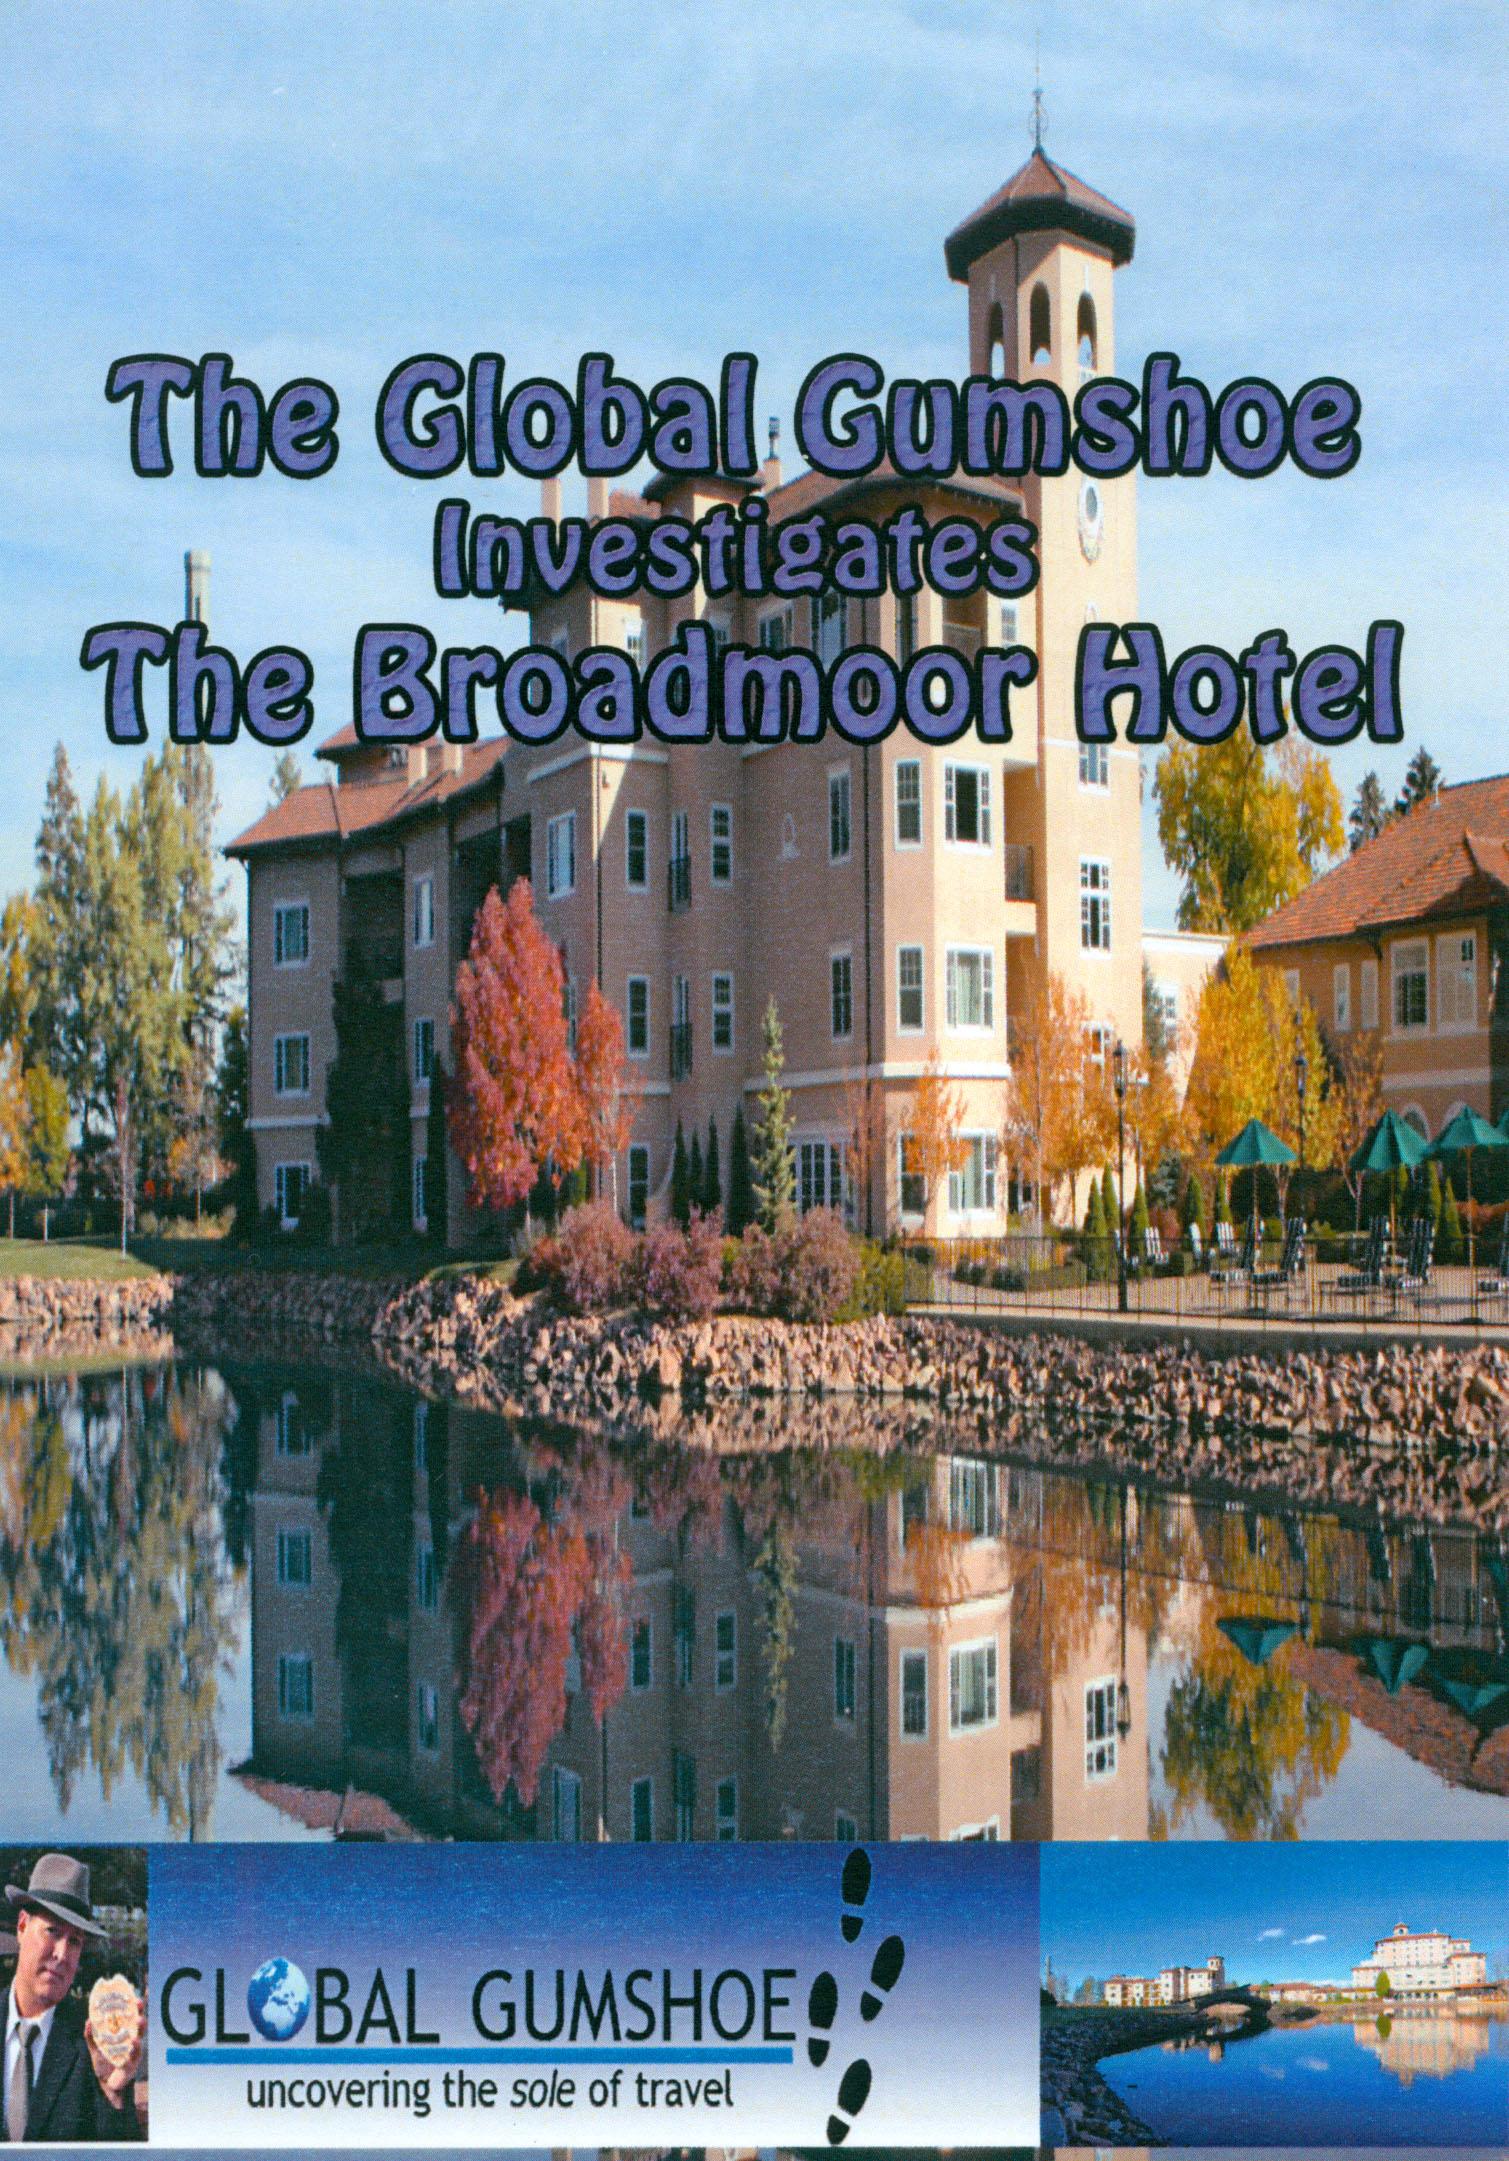 Global Gumshoe Investigates: The Broadmoor Hotel